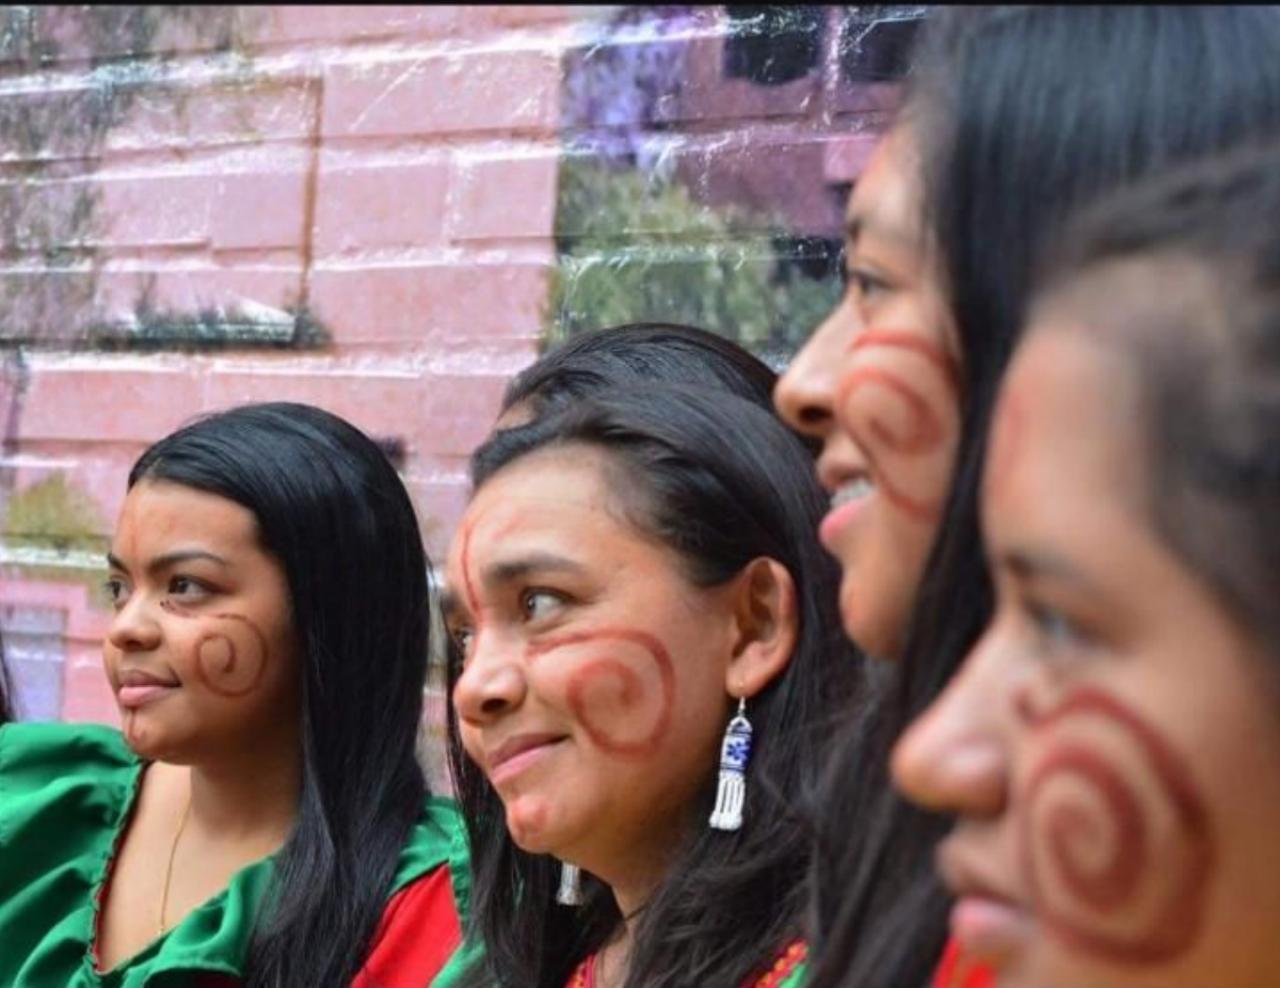 La mujer Wayúu no se vende, la mujer Wayúu se respeta